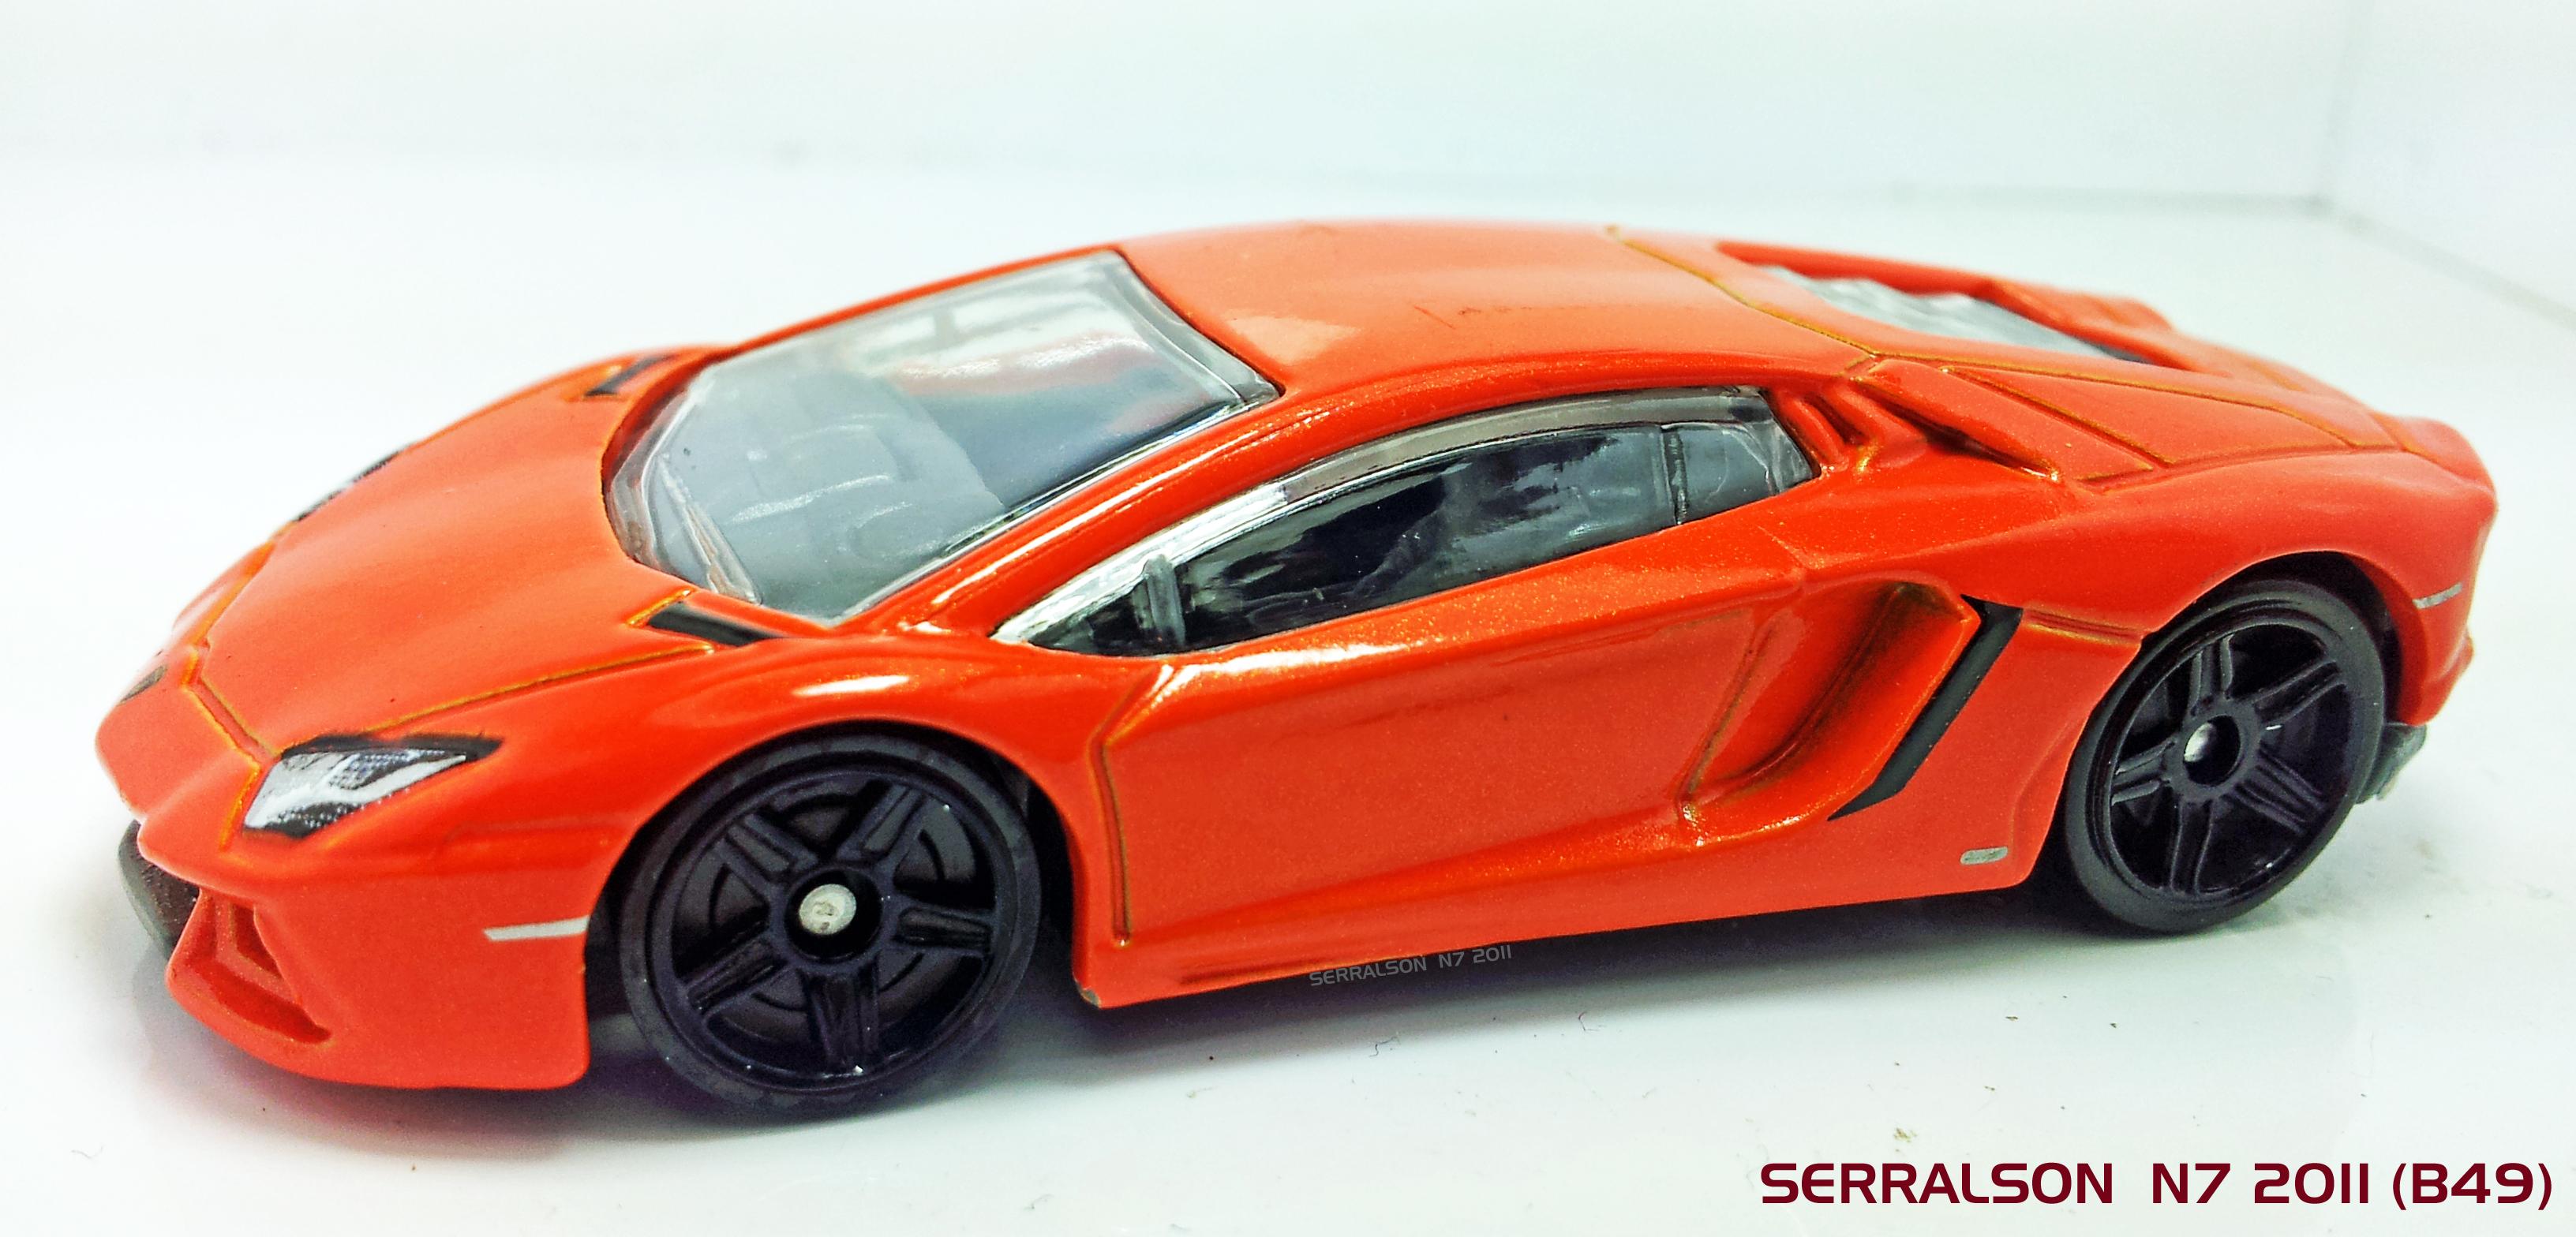 latest?cb=20111216141316 Surprising Lamborghini Gallardo Hot Wheels Wiki Cars Trend